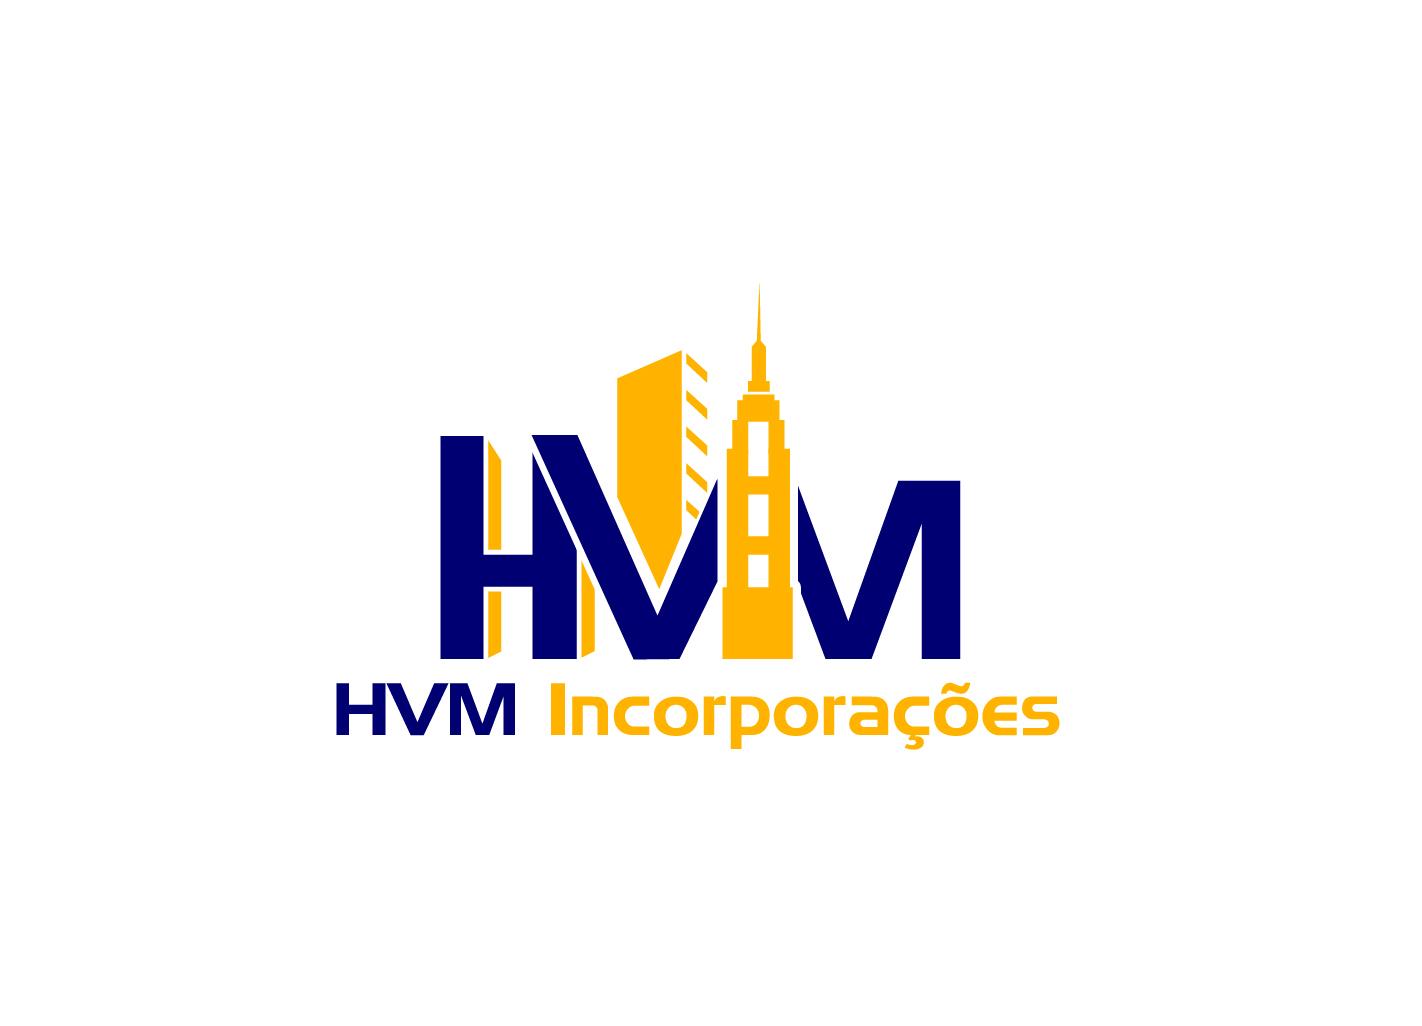 Professional Serious Real Estate Development Logo Design For Hvm